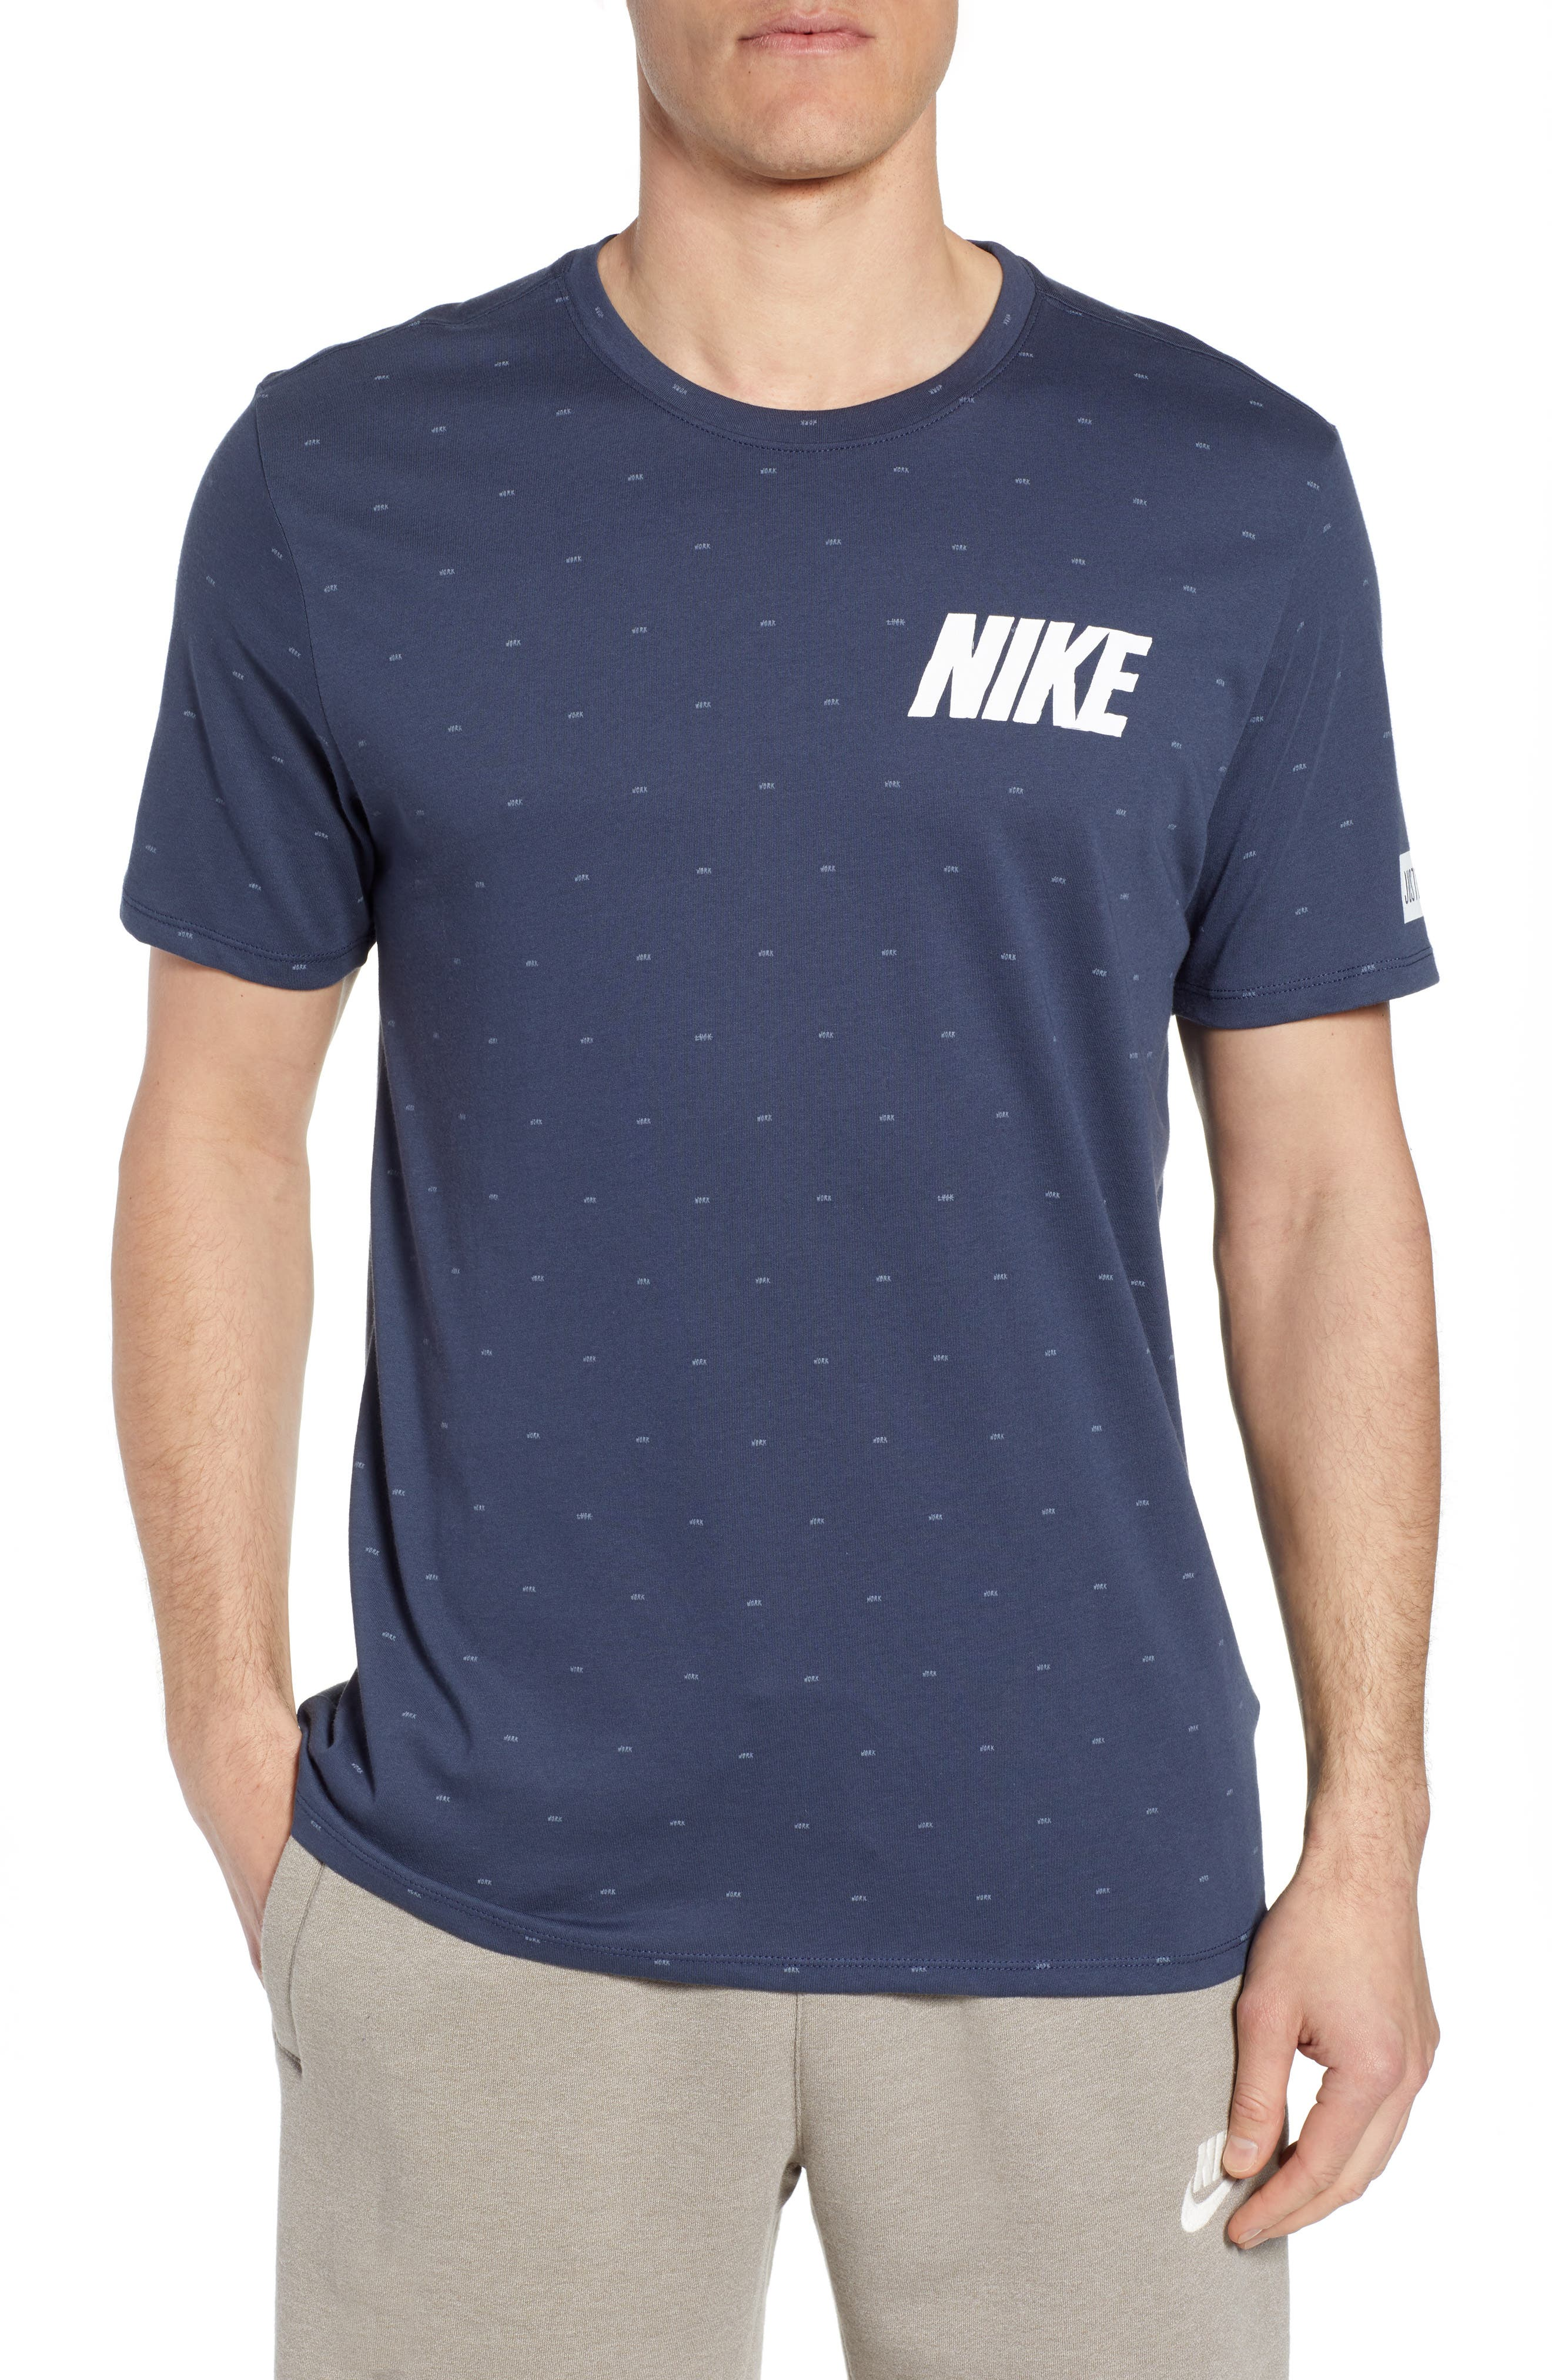 Nike Dry Print T-Shirt Blue